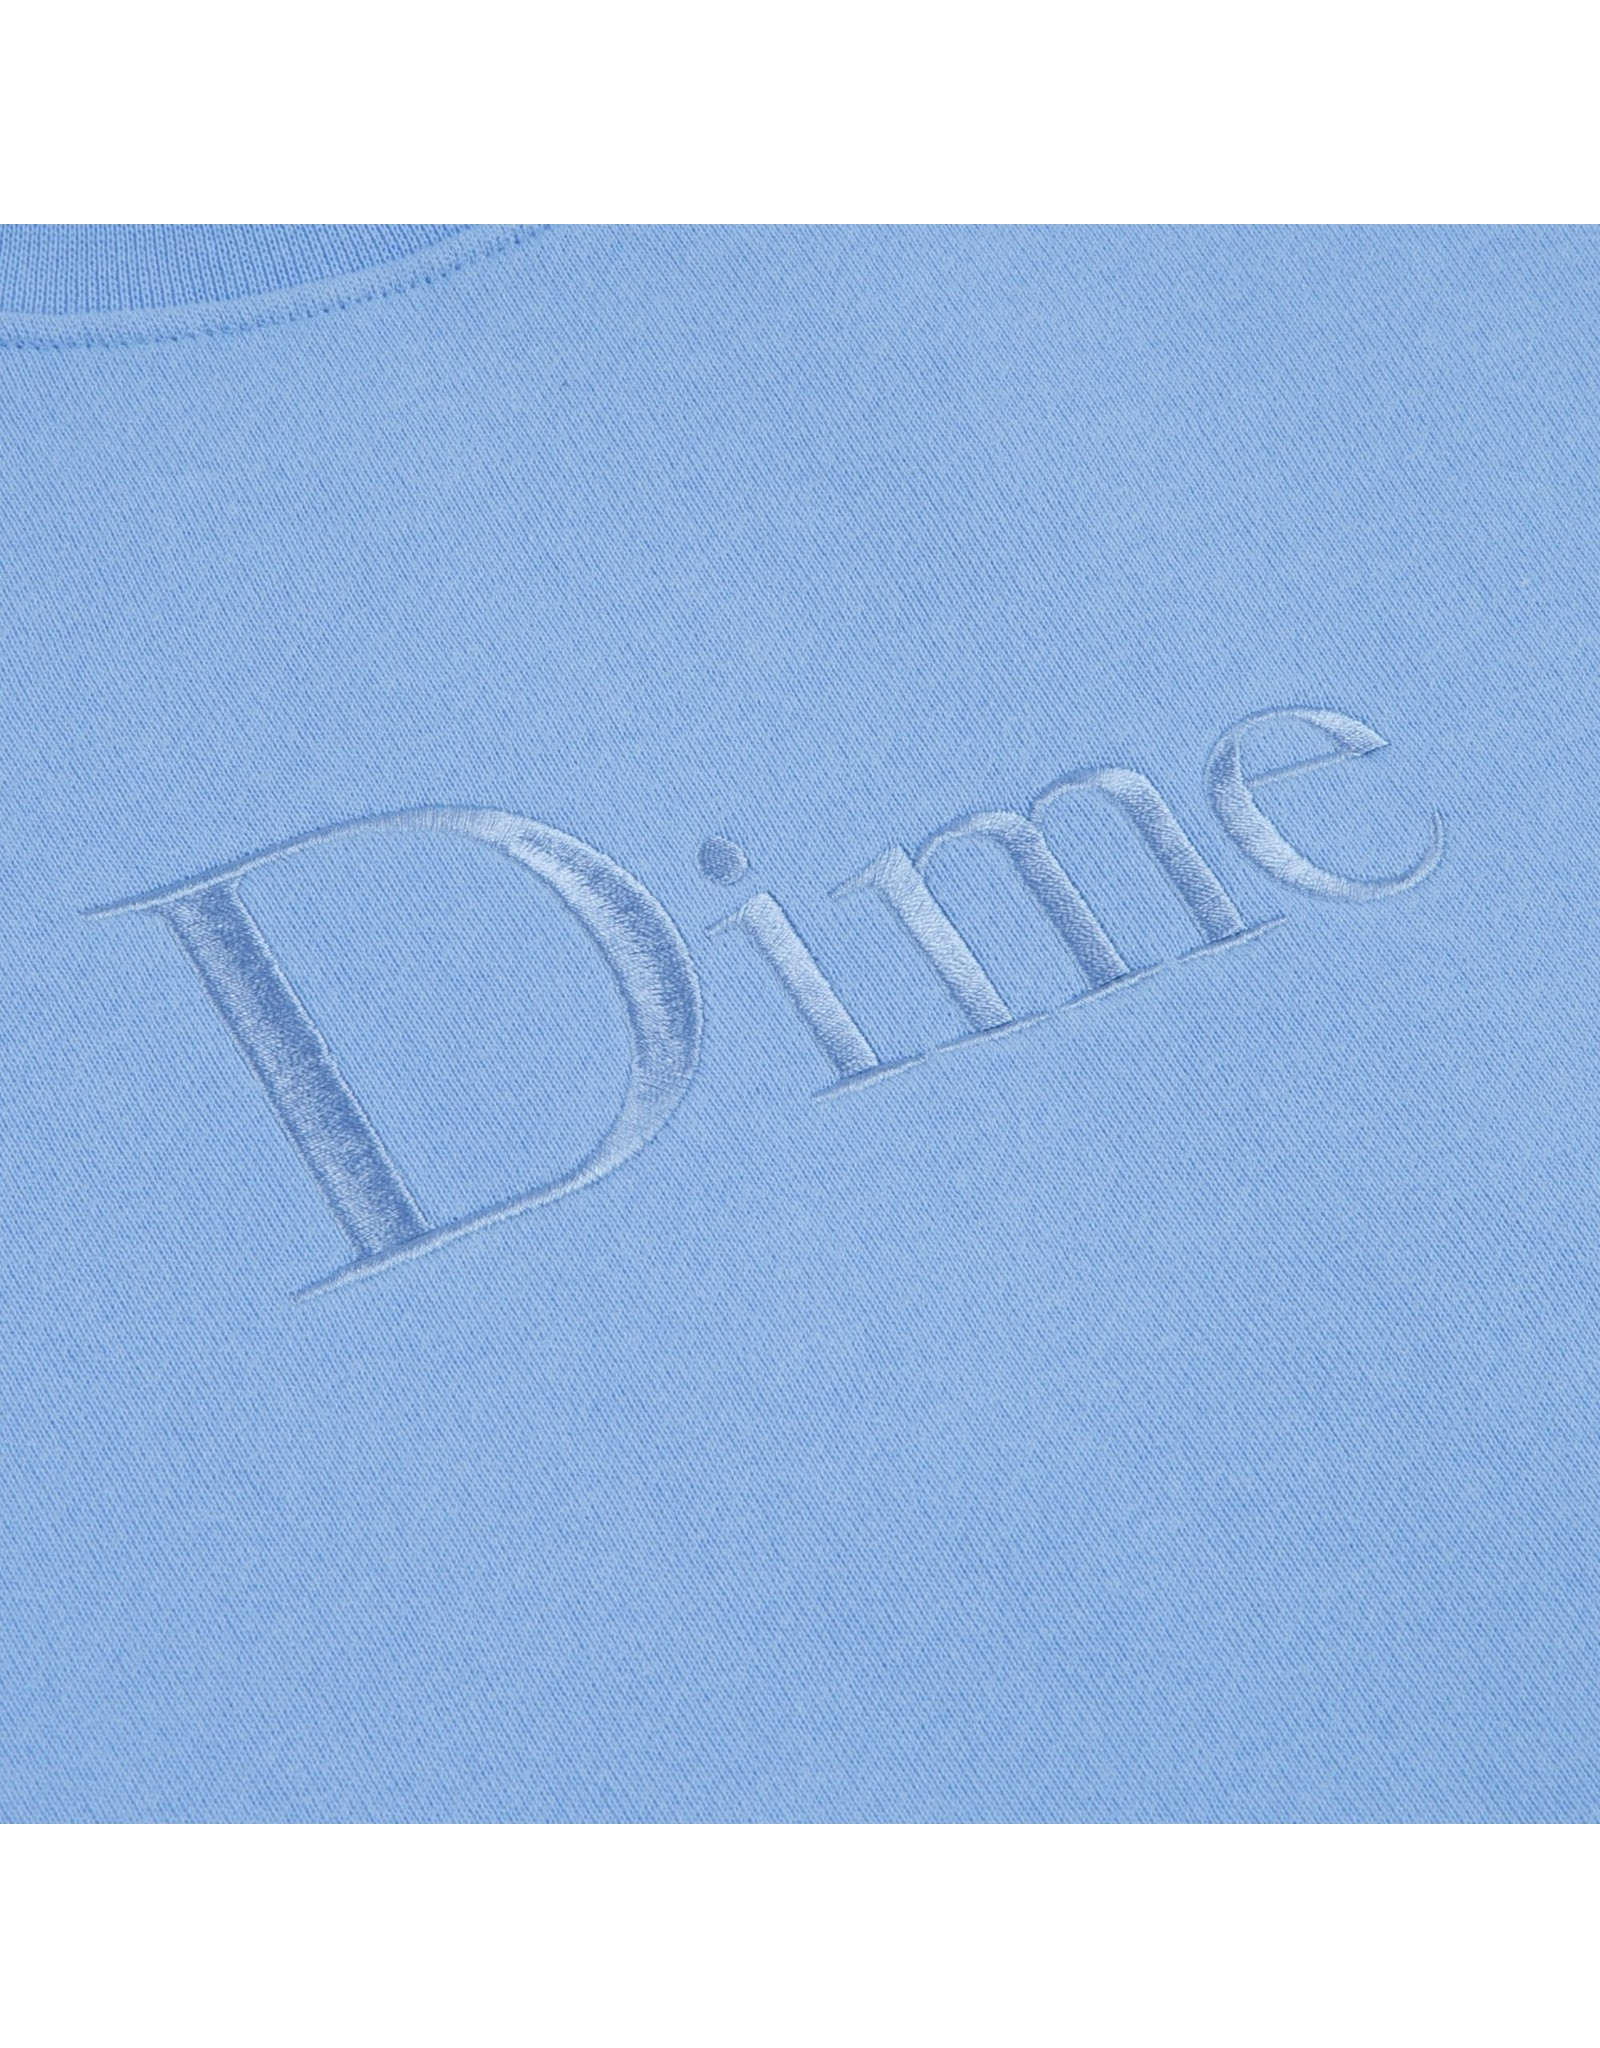 Dime Classic Crewneck - Carolina Blue